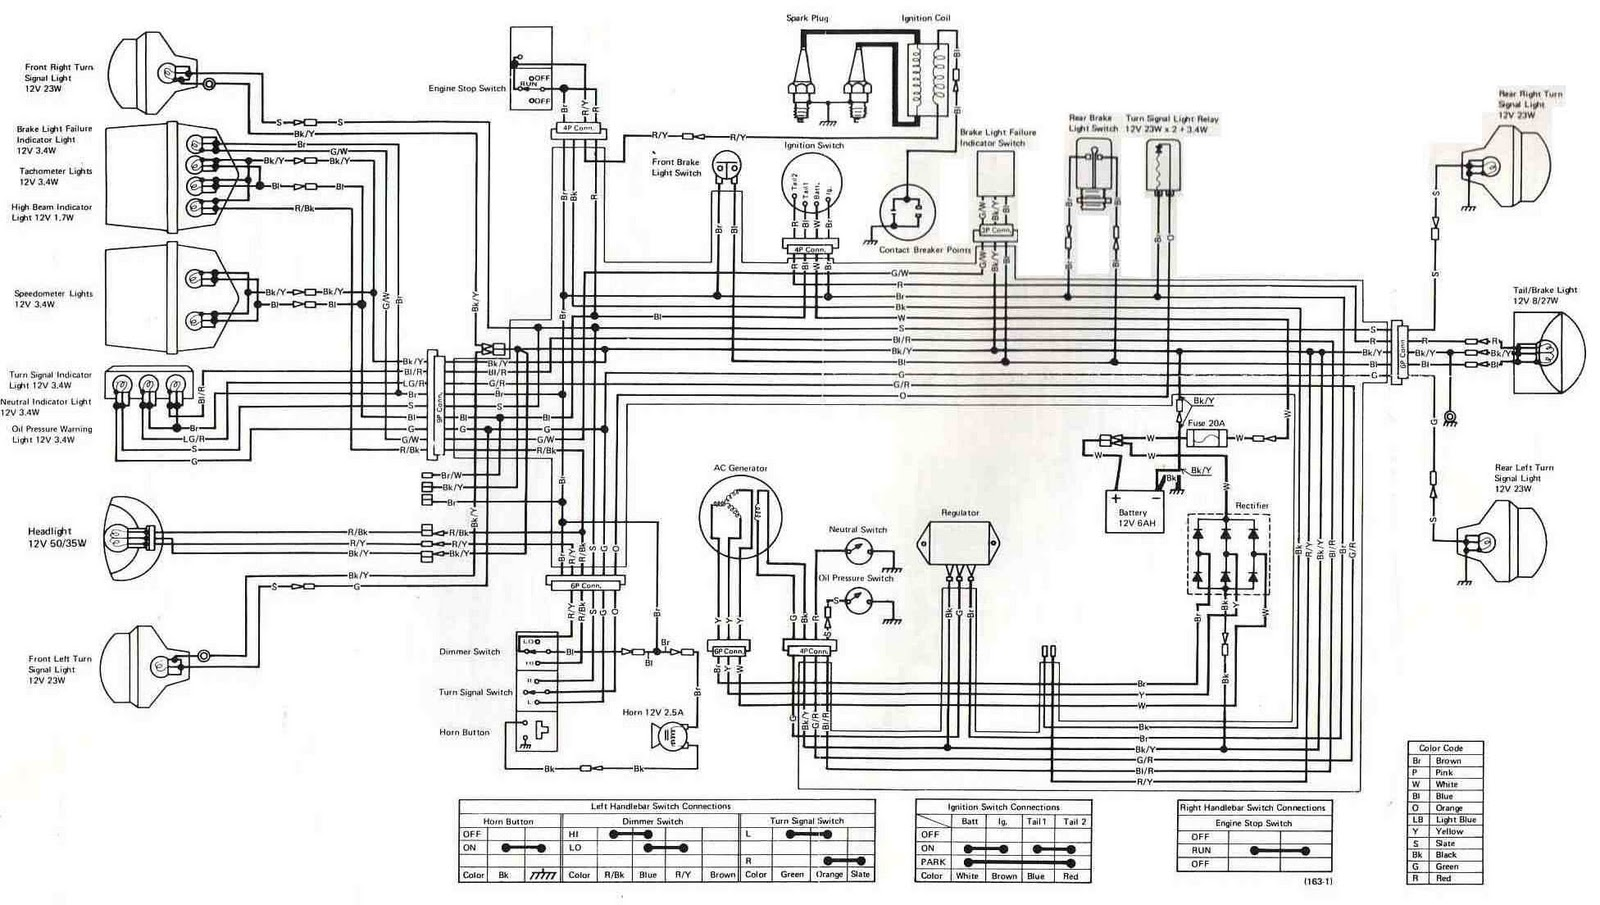 Kawasaki KZ400 1975 Electrical Wiring Diagram | All about Wiring Diagrams